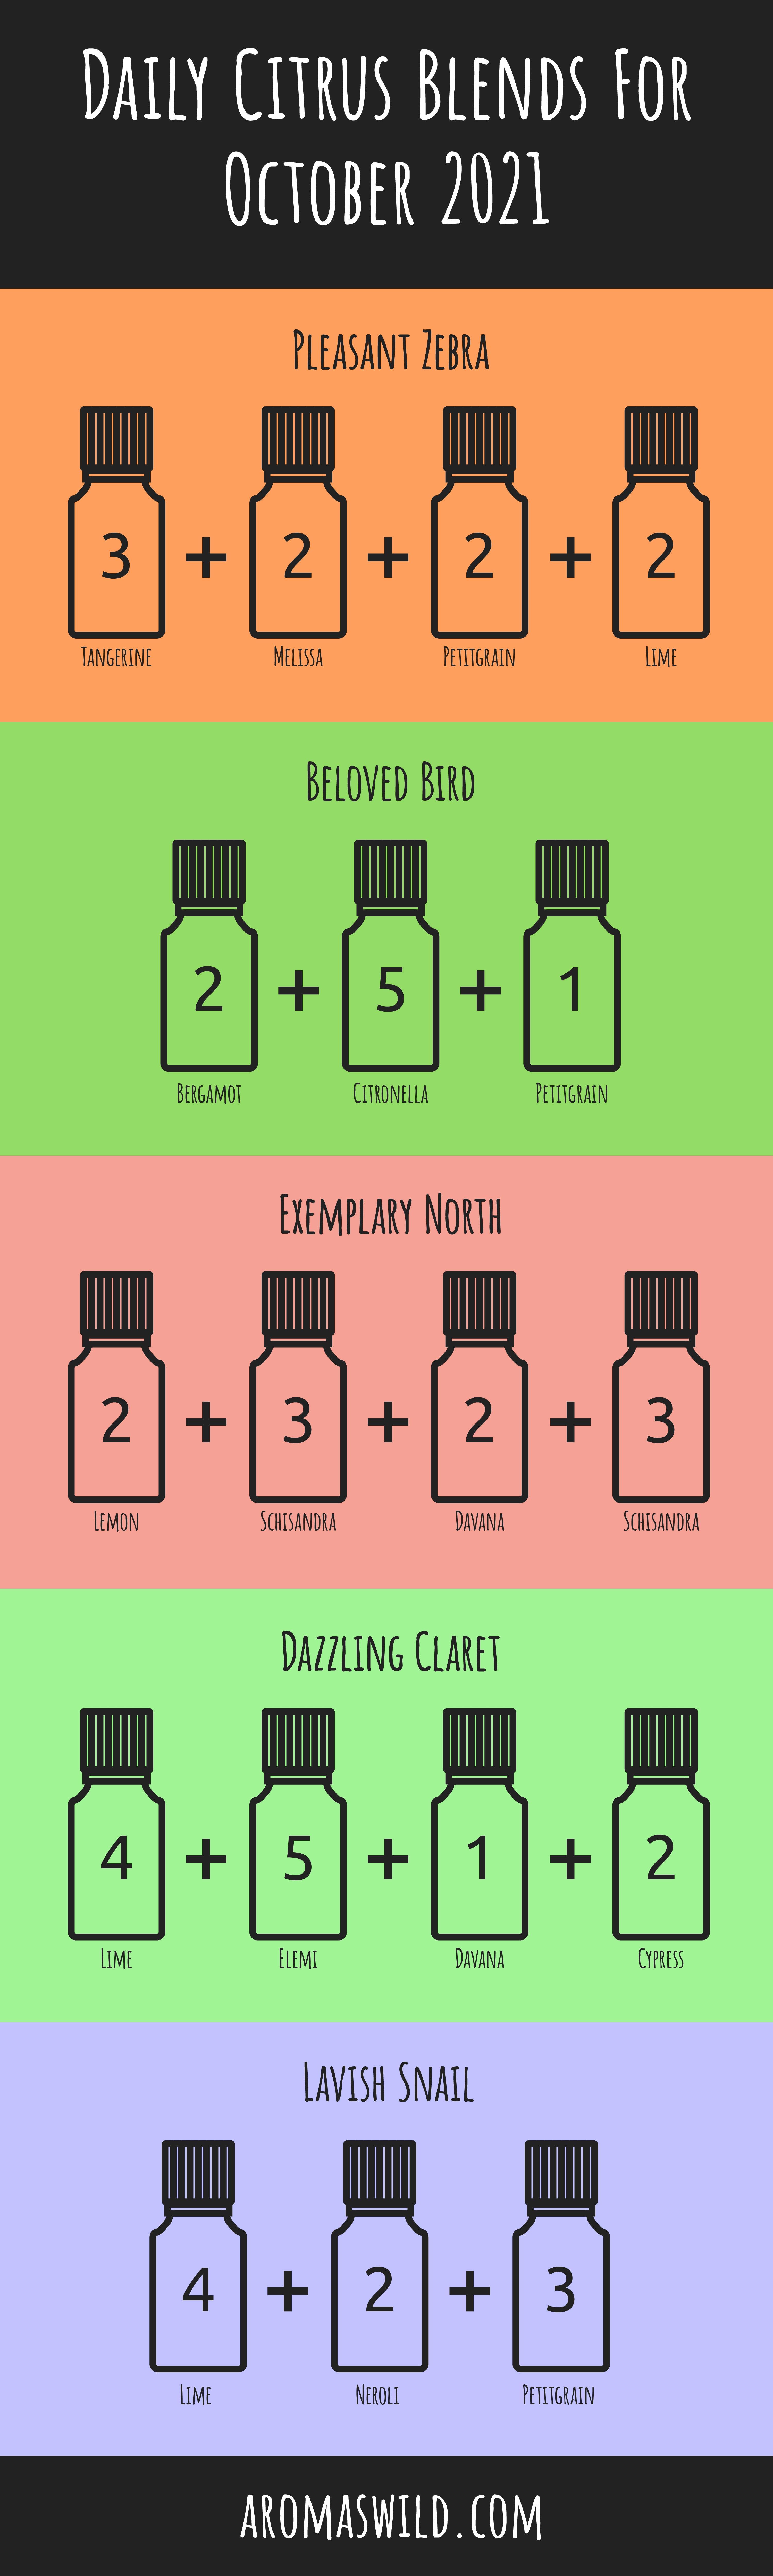 essential oil formula – Daily Citrus Blends For 17 October 2021